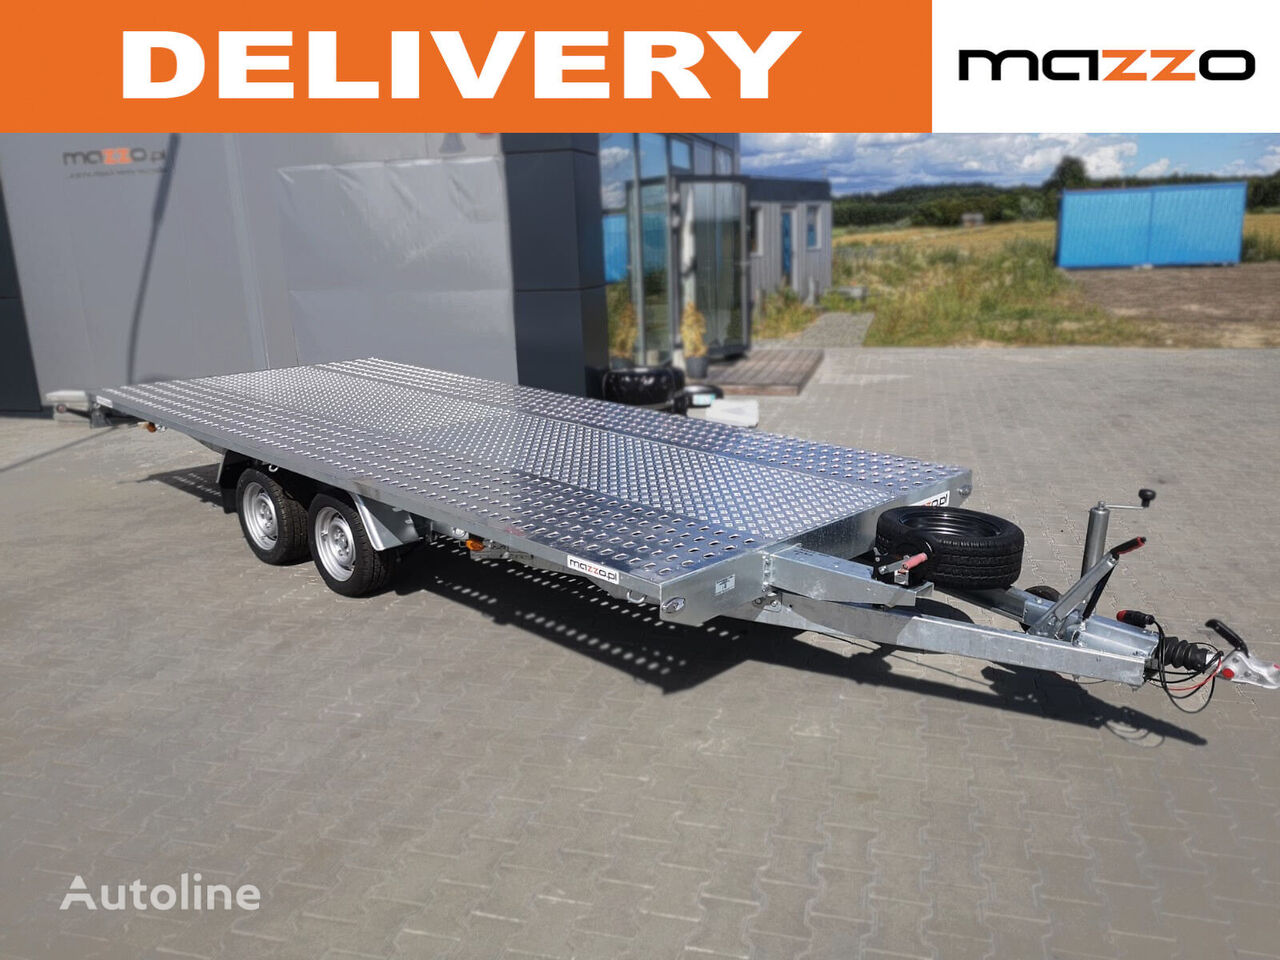 M4027 400x210cm 2700kg platform remolque portacoches nuevo